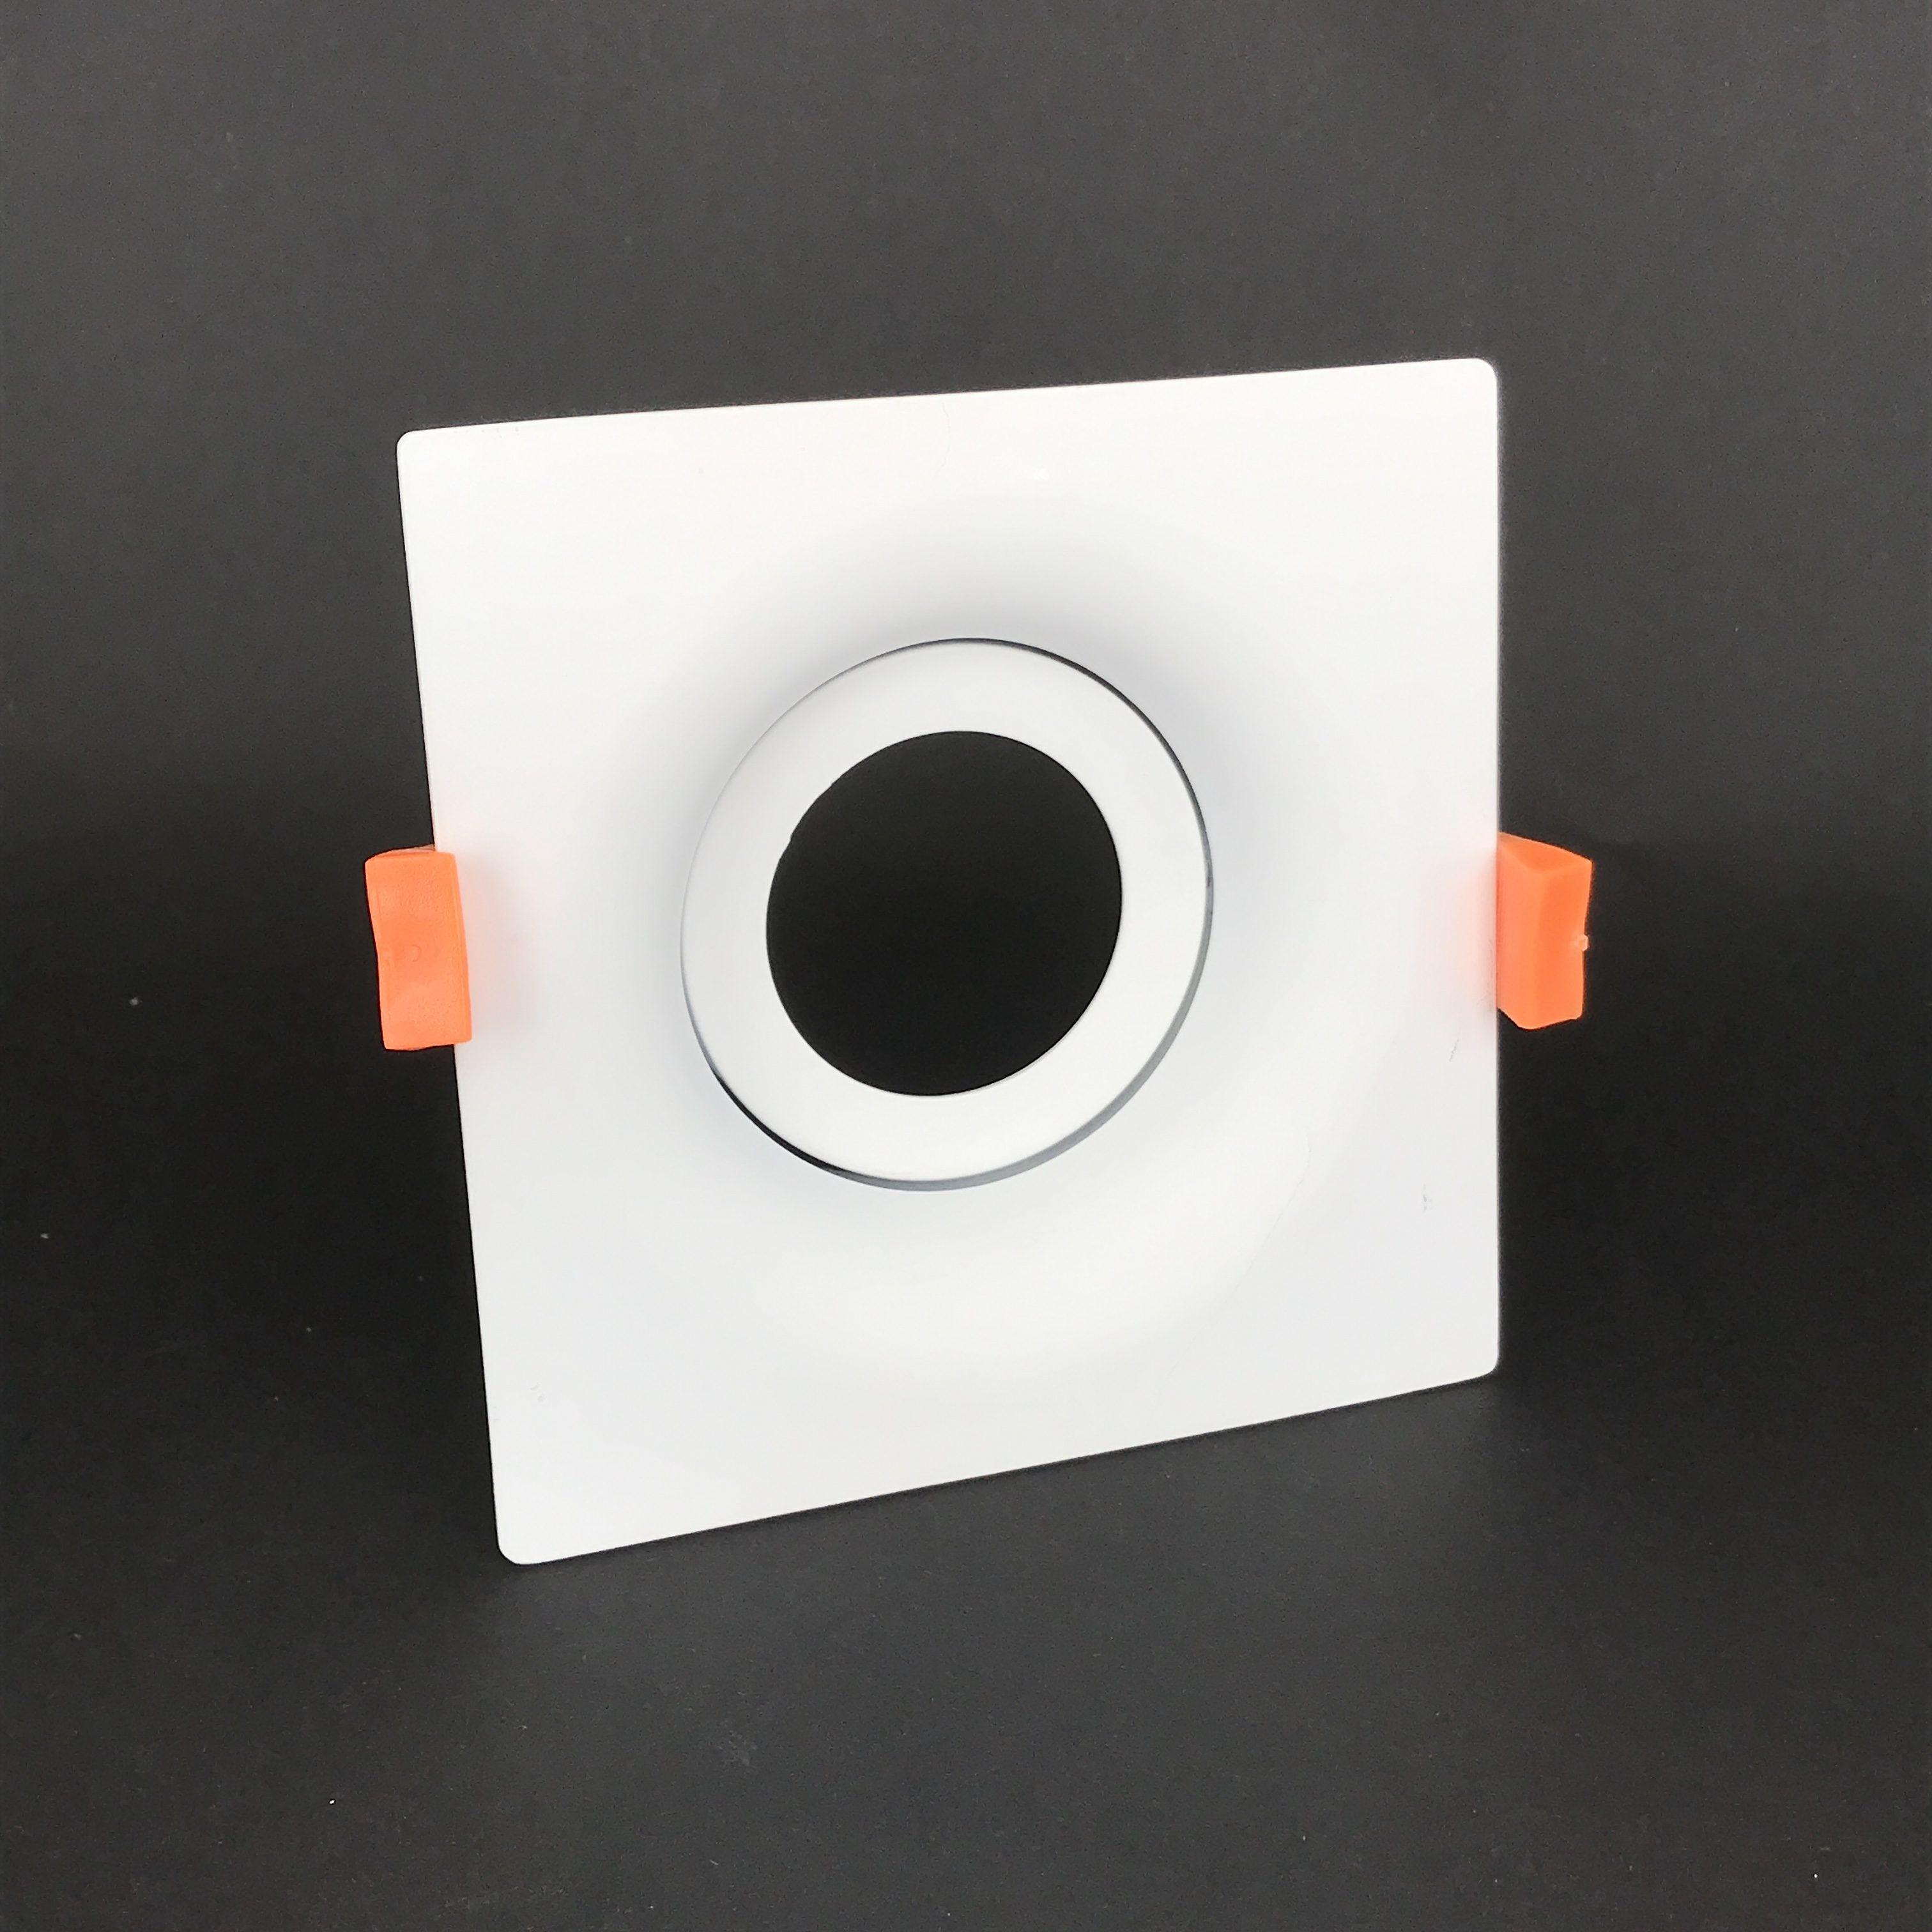 Inbouwring 110mm organisch vierkant wit